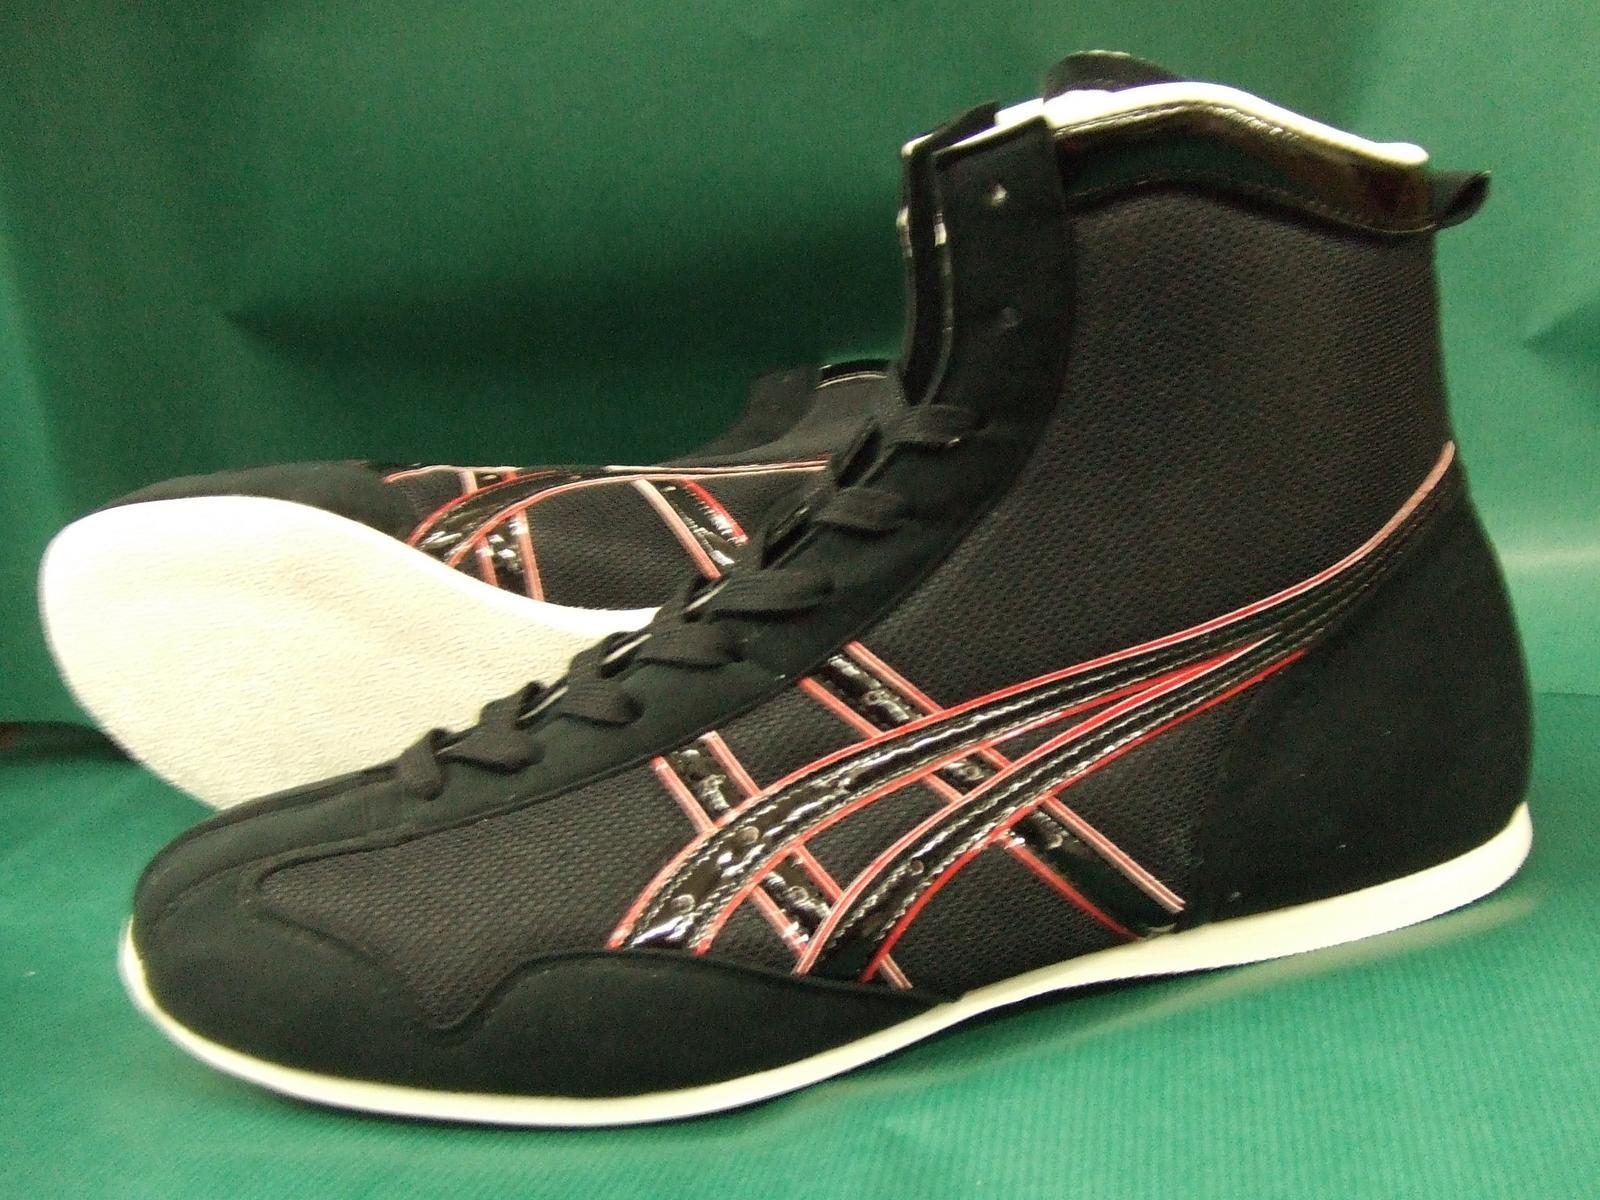 Asics Shoes America Online